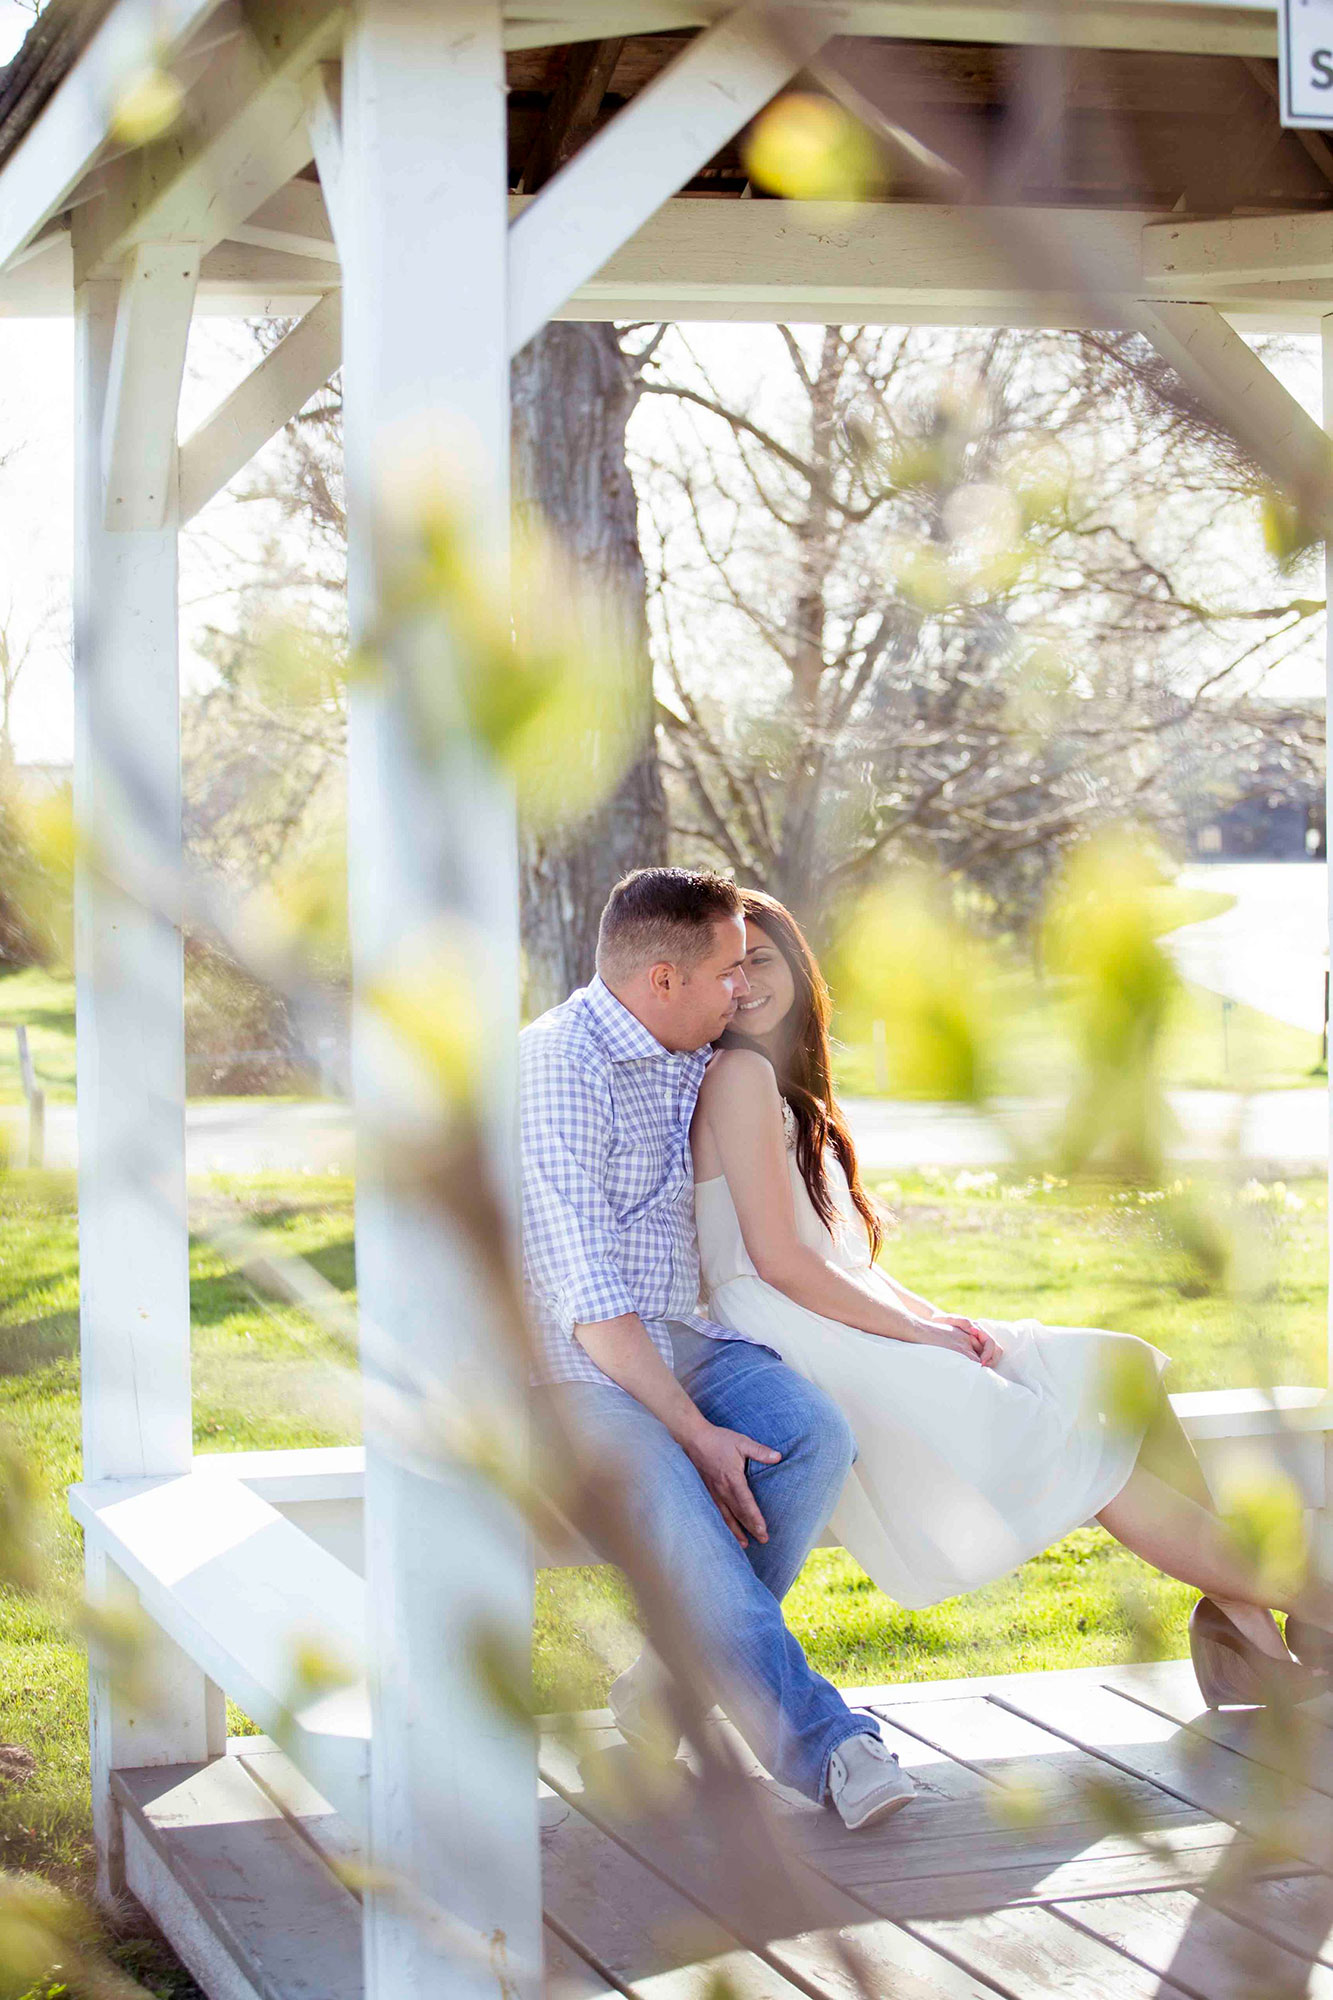 Niagara-on-the-Lake-Engagement-Vineyard-Bride-Photo-By-Gemini-Photography-021.jpg